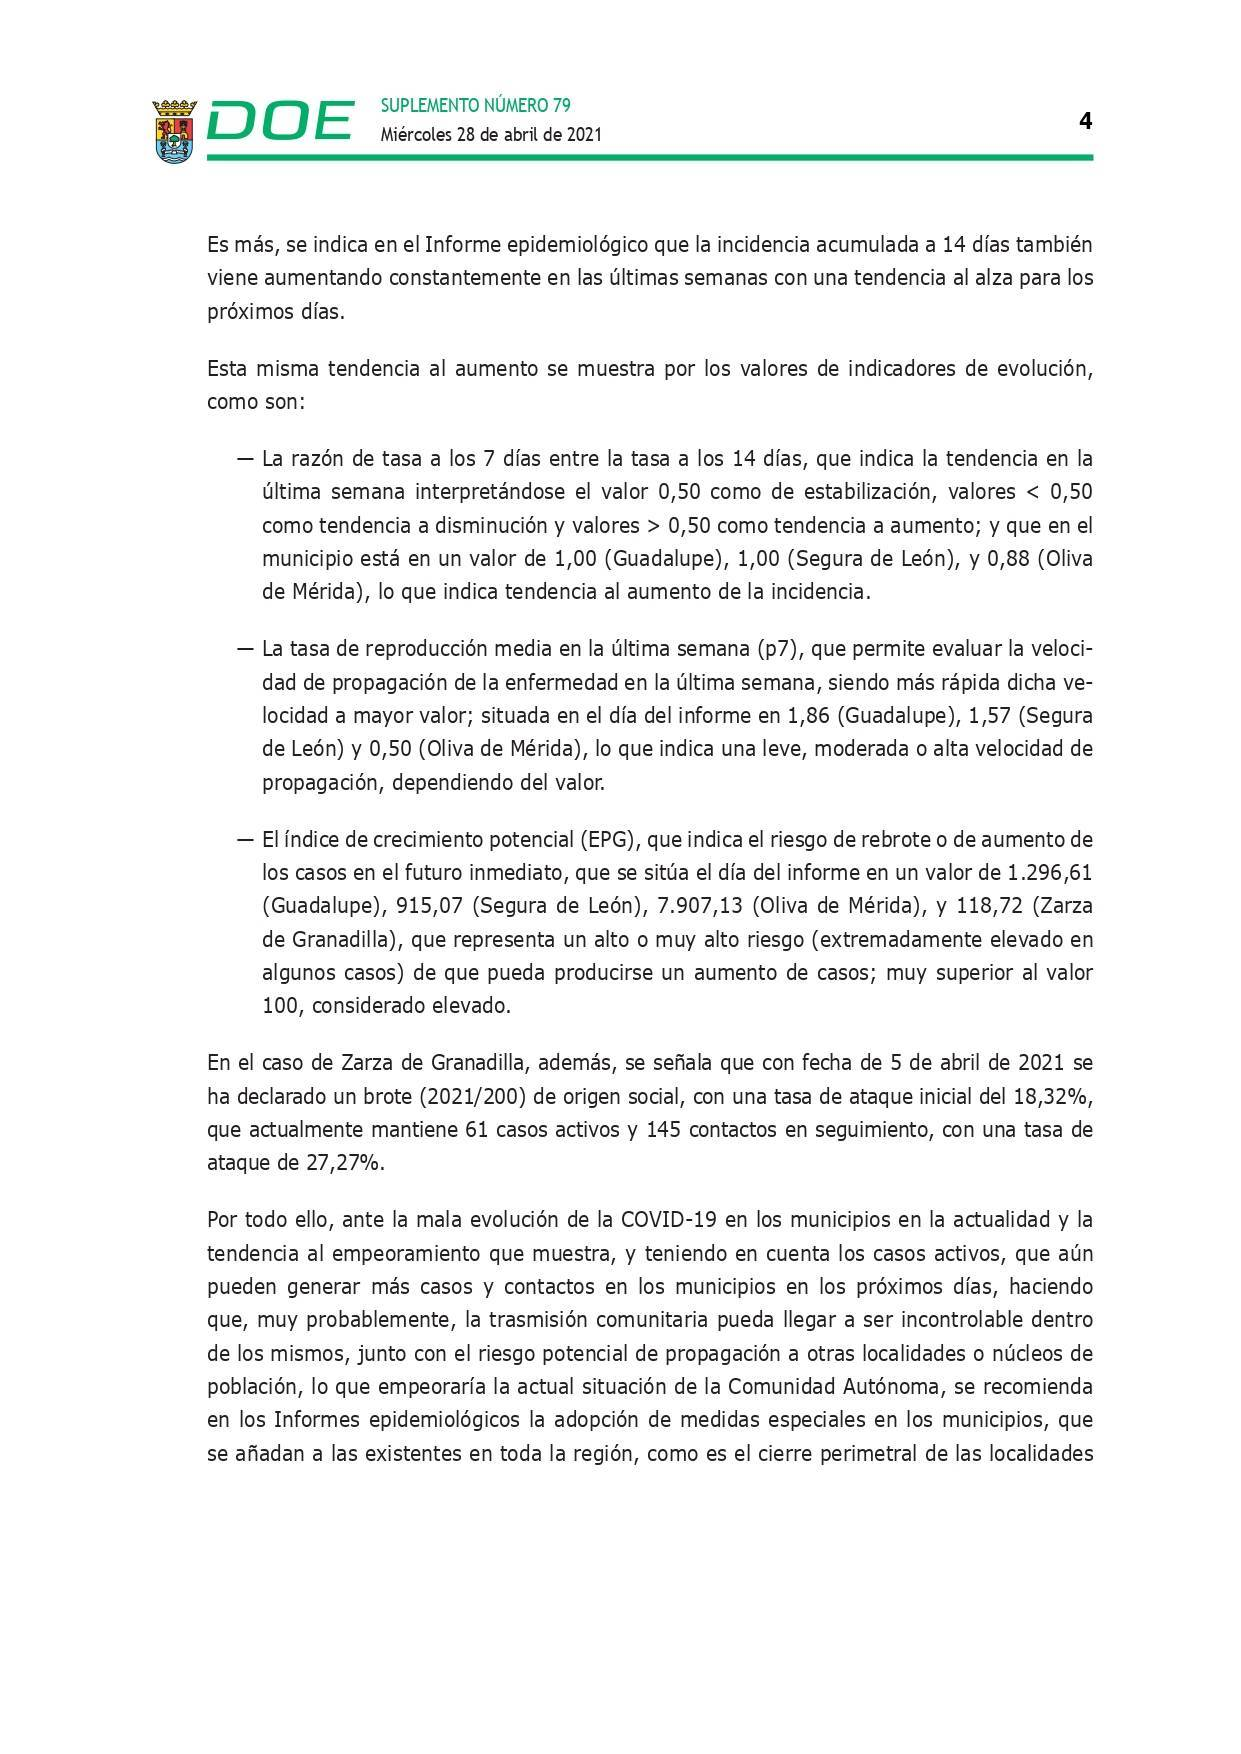 Cierre perimetral por COVID-19 (abril 2021) - Guadalupe (Cáceres) 4